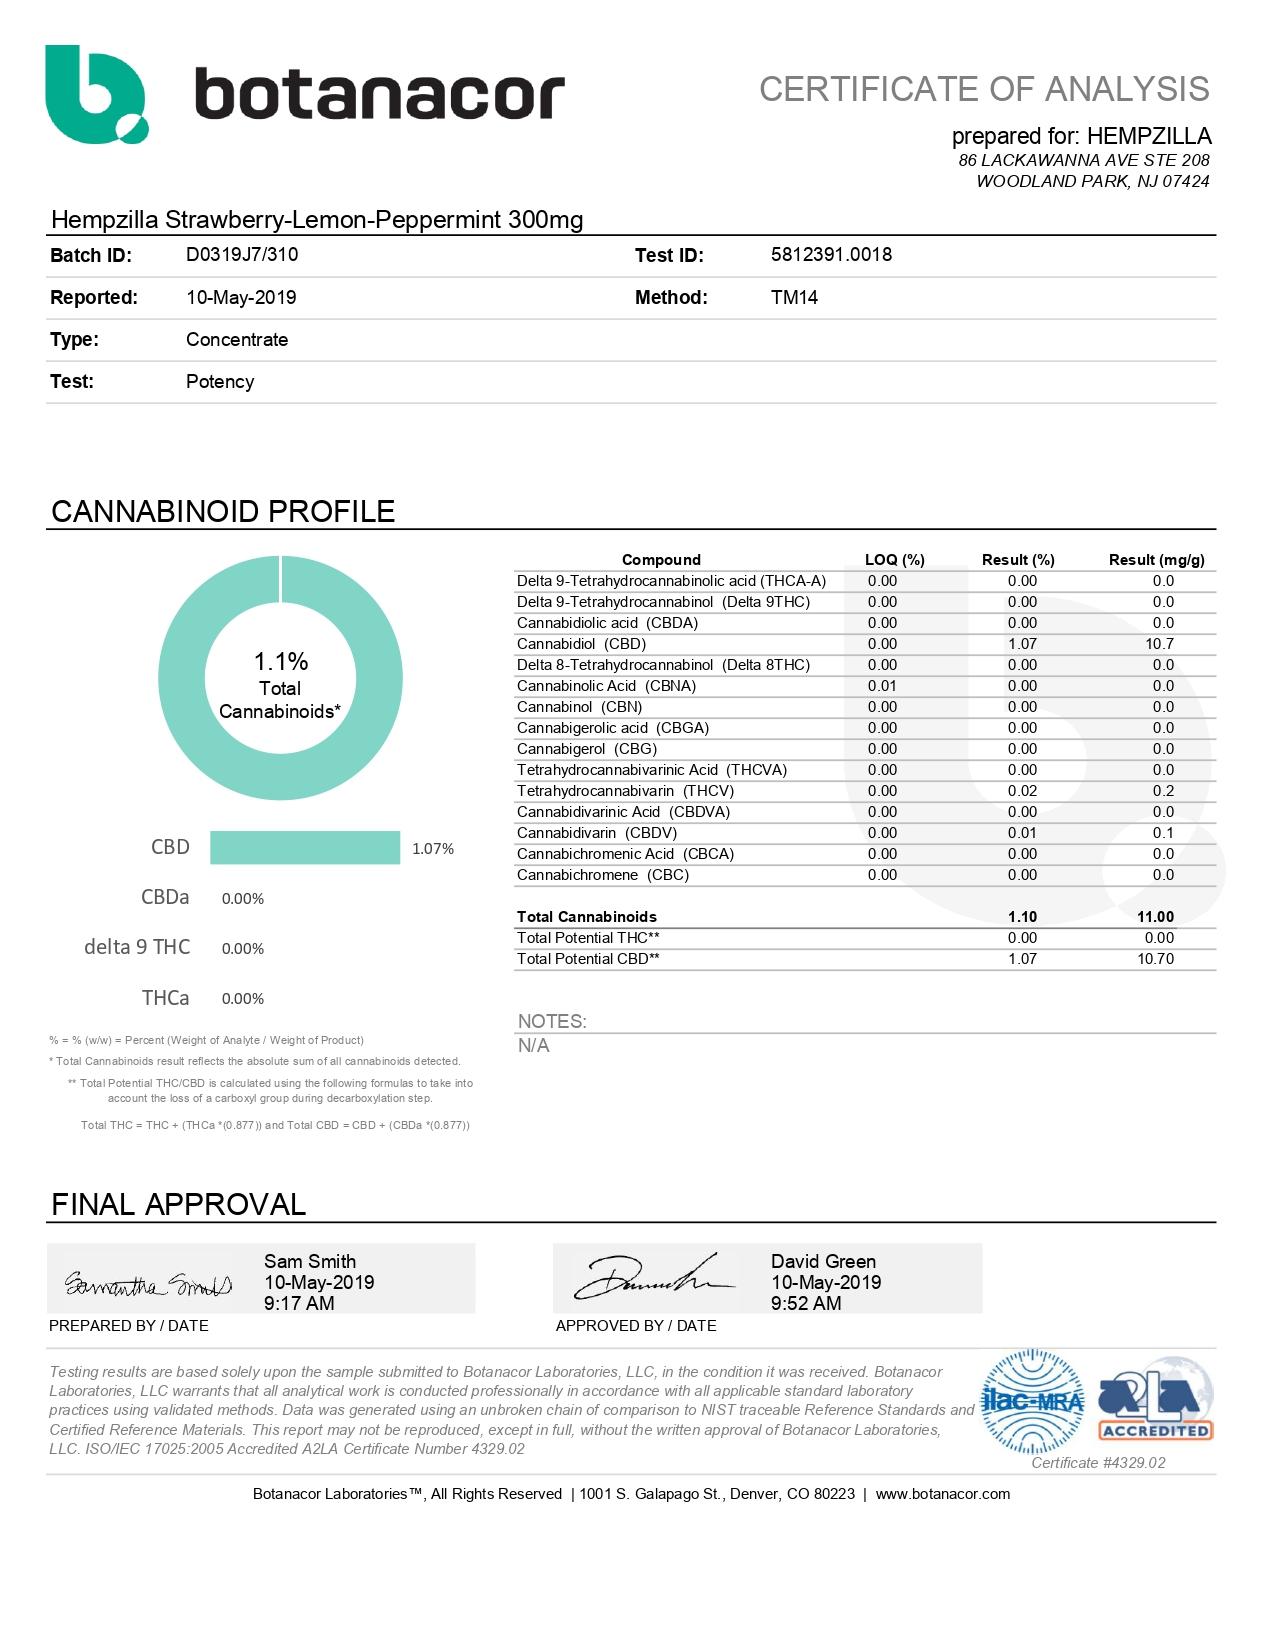 Hempzilla CBD Tincture Lemon Berry Mint 300mg Lab Report